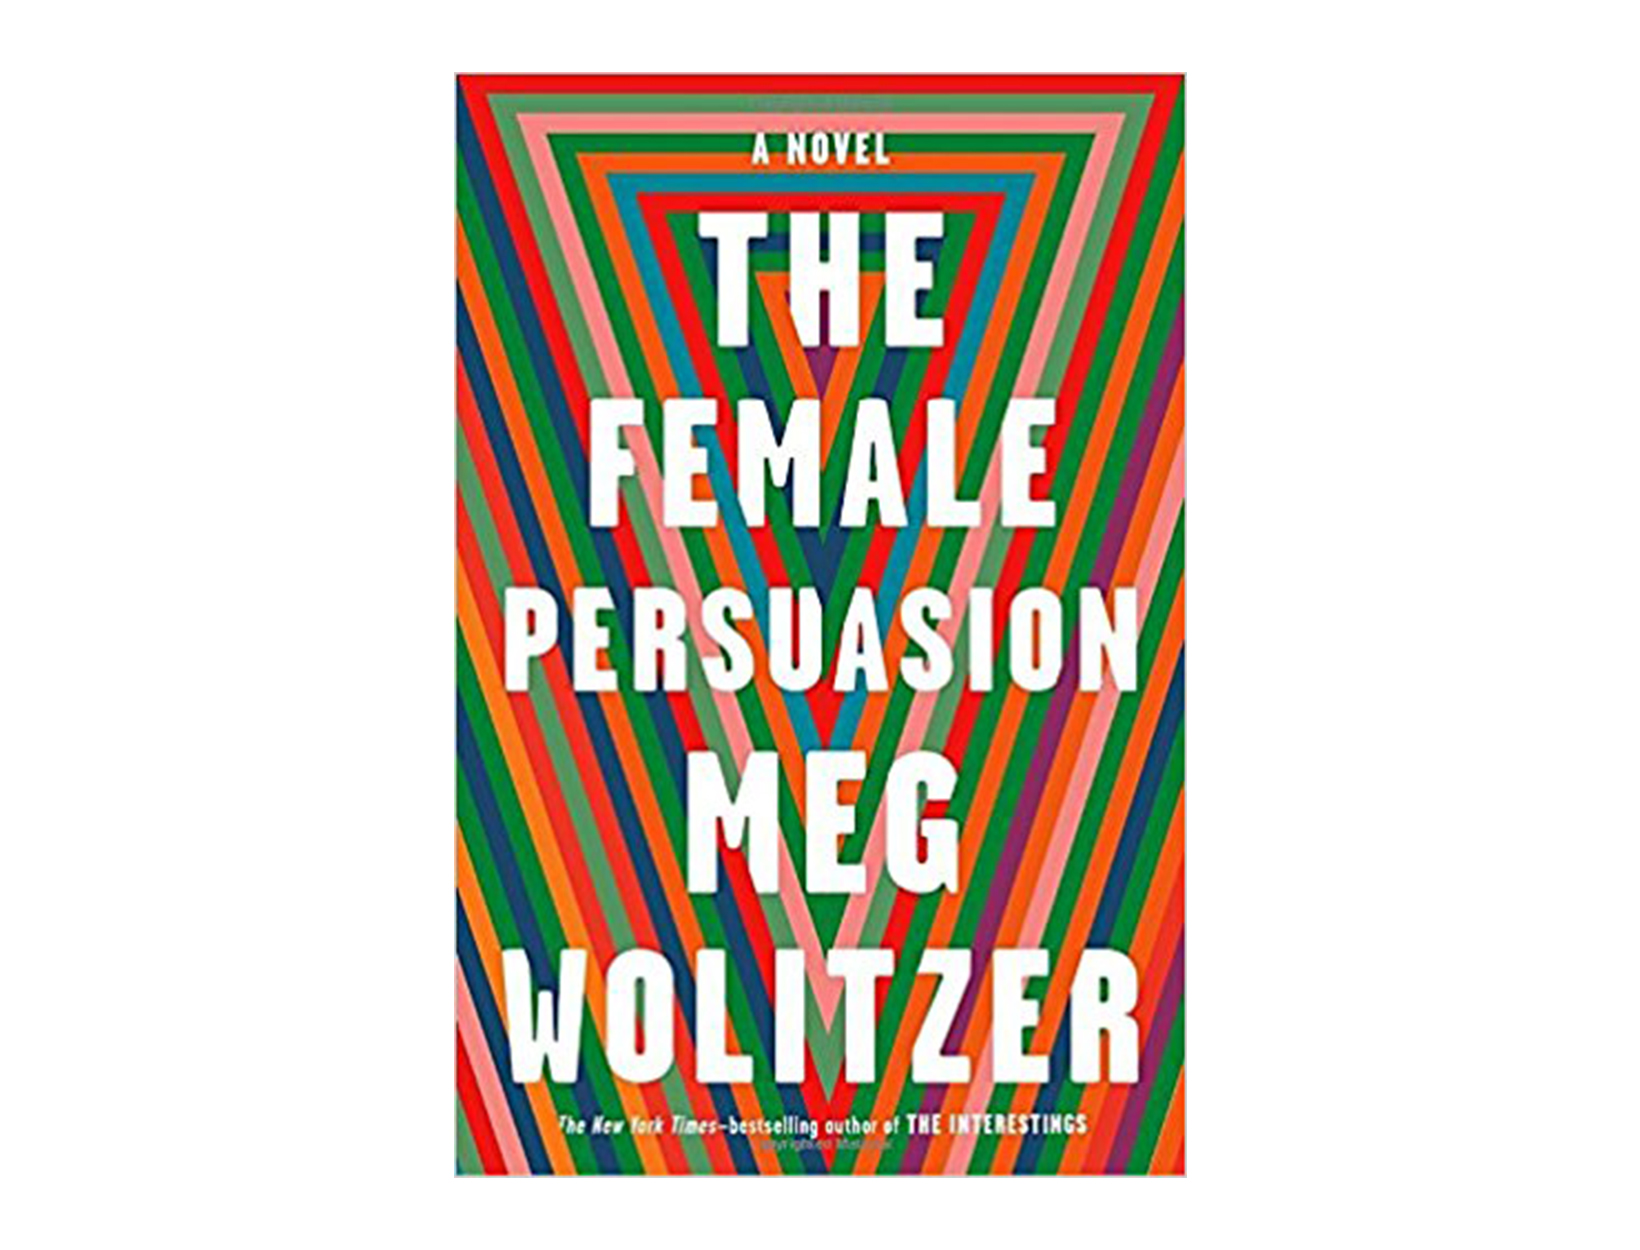 <em>The Female Persuasion</em> by Meg Wolitzer